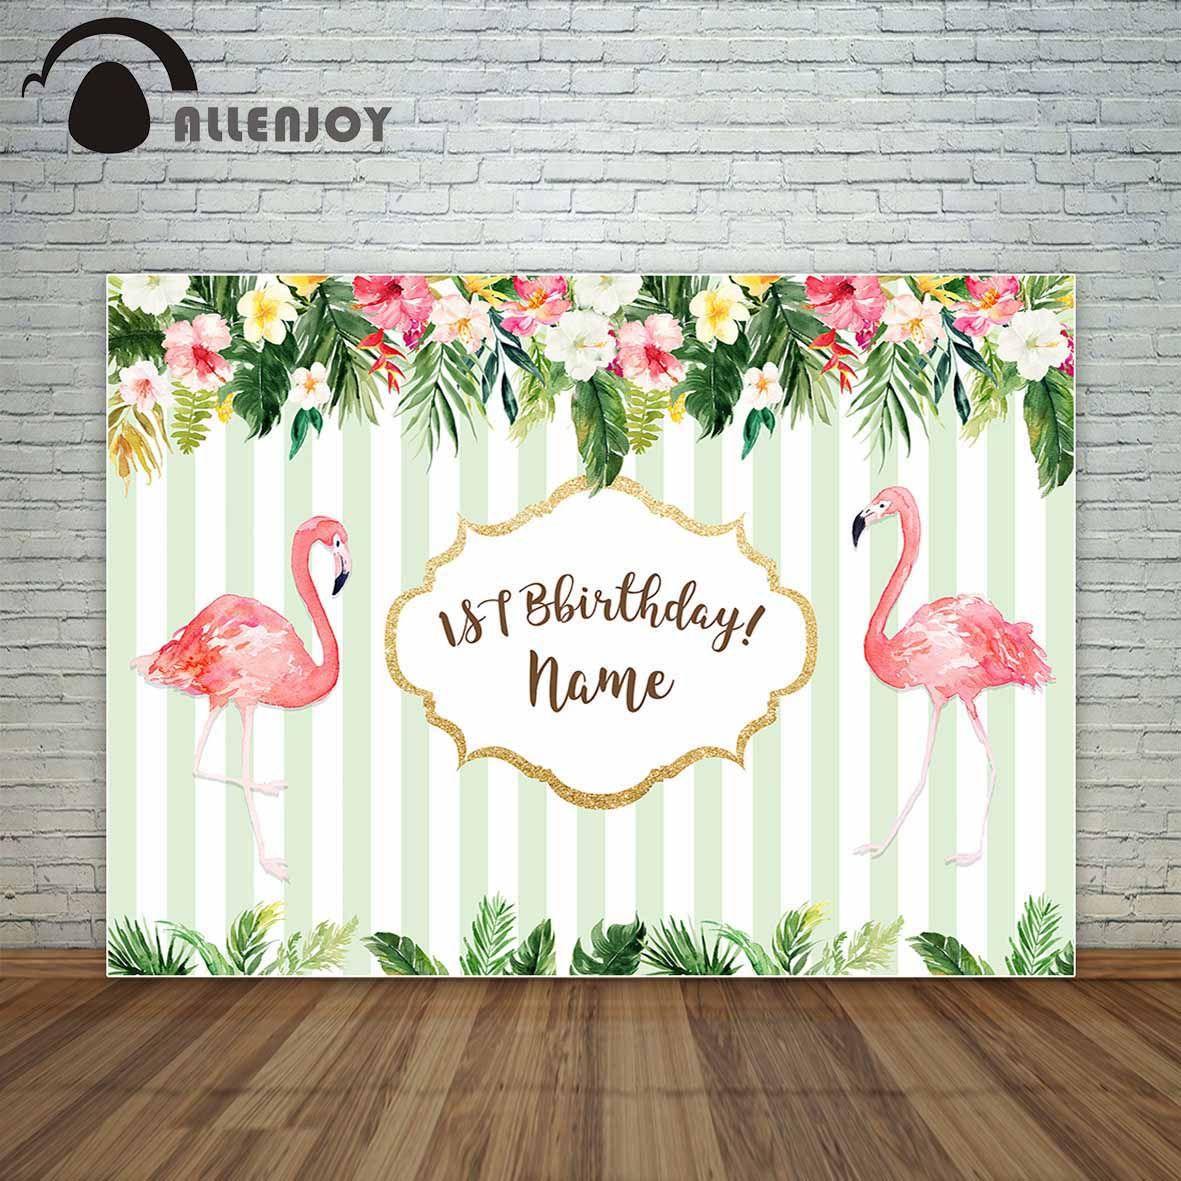 Allenjoy Birthday Custom Backdrop Flamingo Tropical Theme